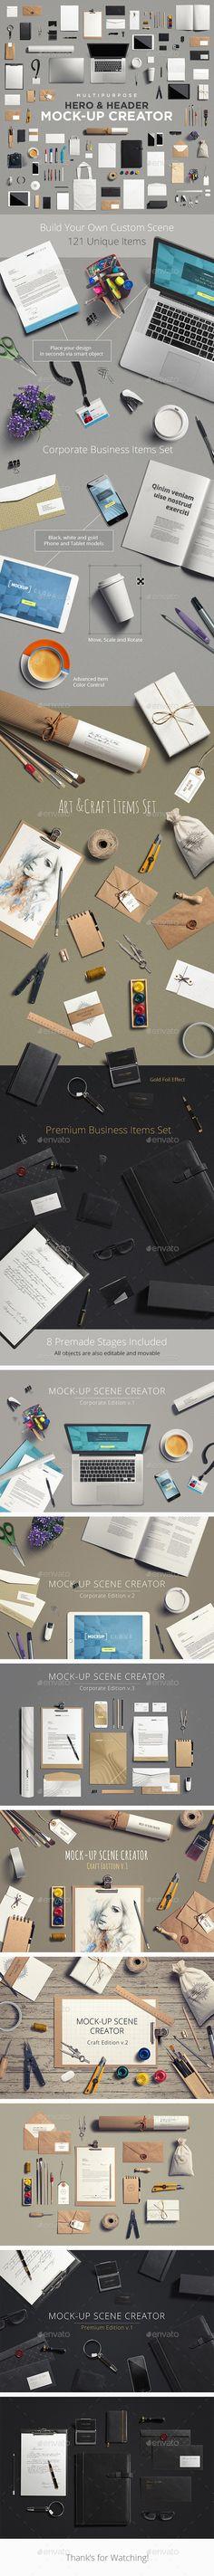 Multipurpose Mock-Up Creator (Stationery)